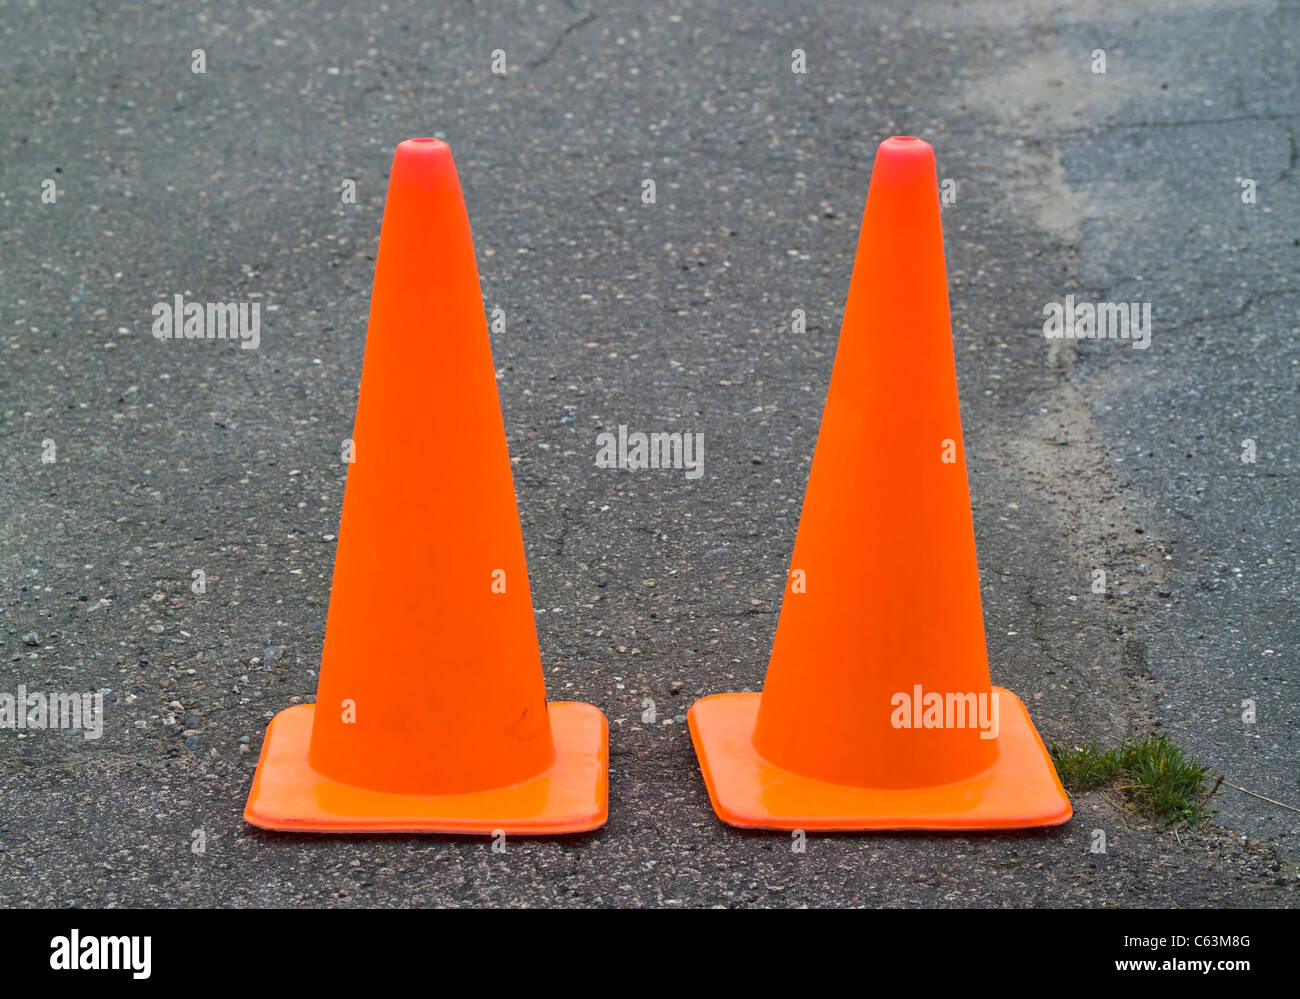 traffic cones on tarmac - Stock Image